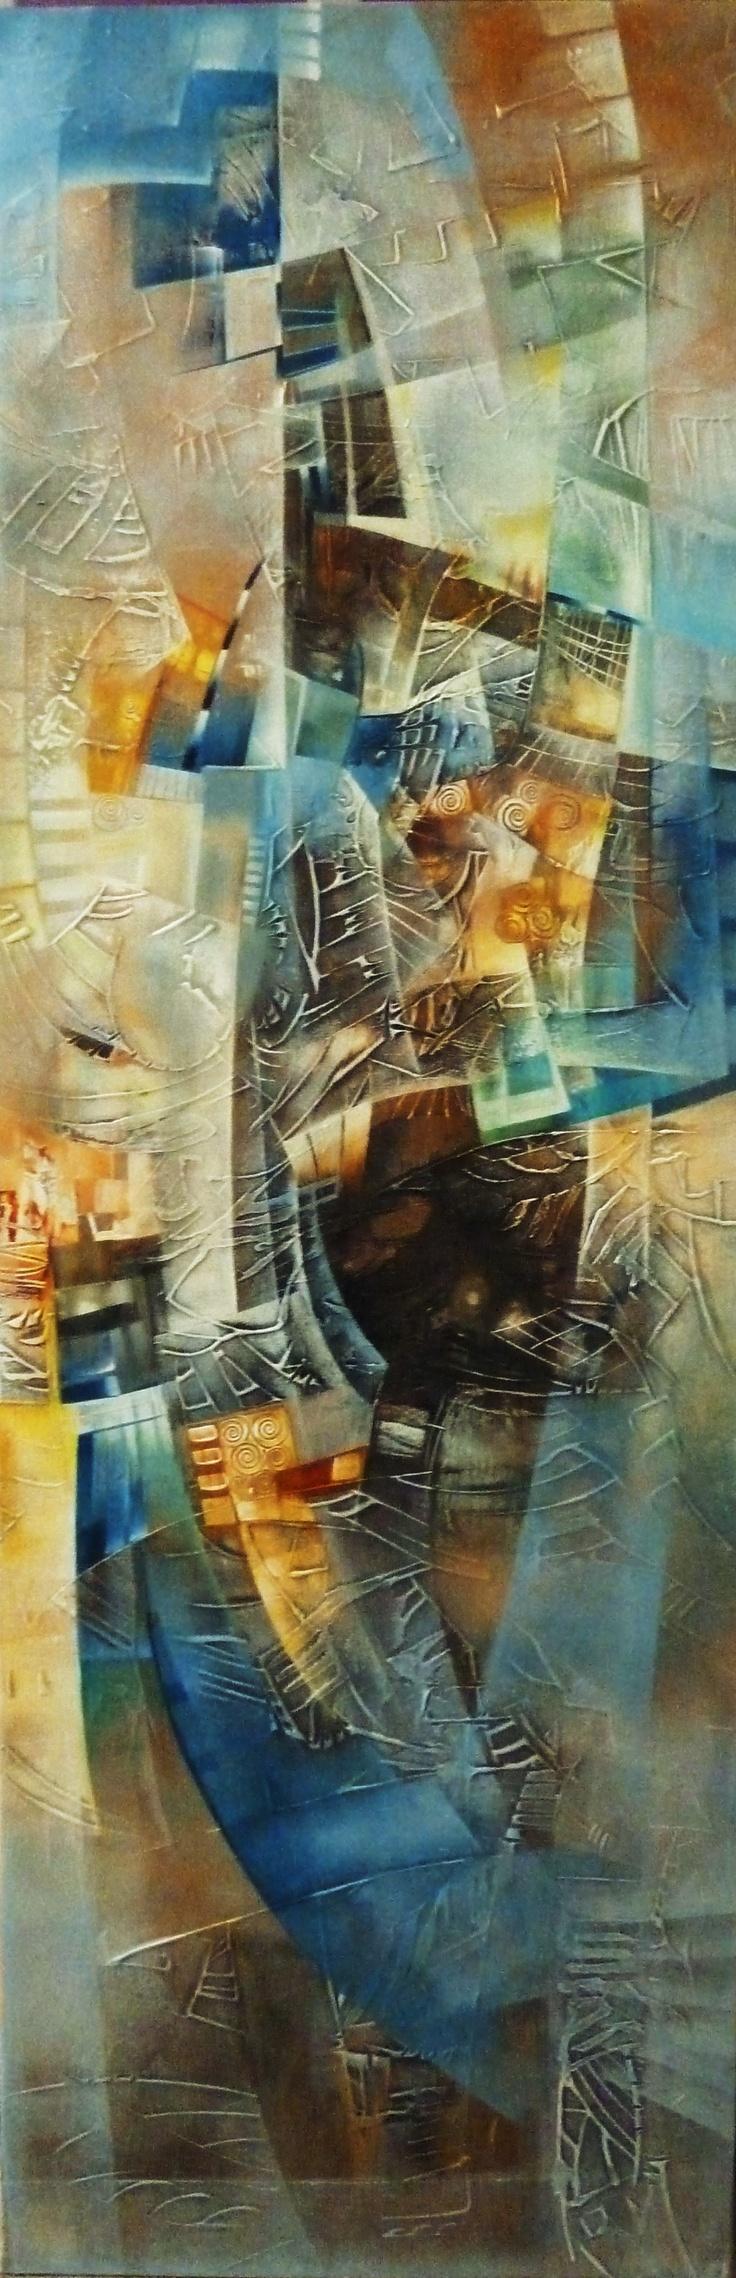 abstract art by amandine et romain Torrente